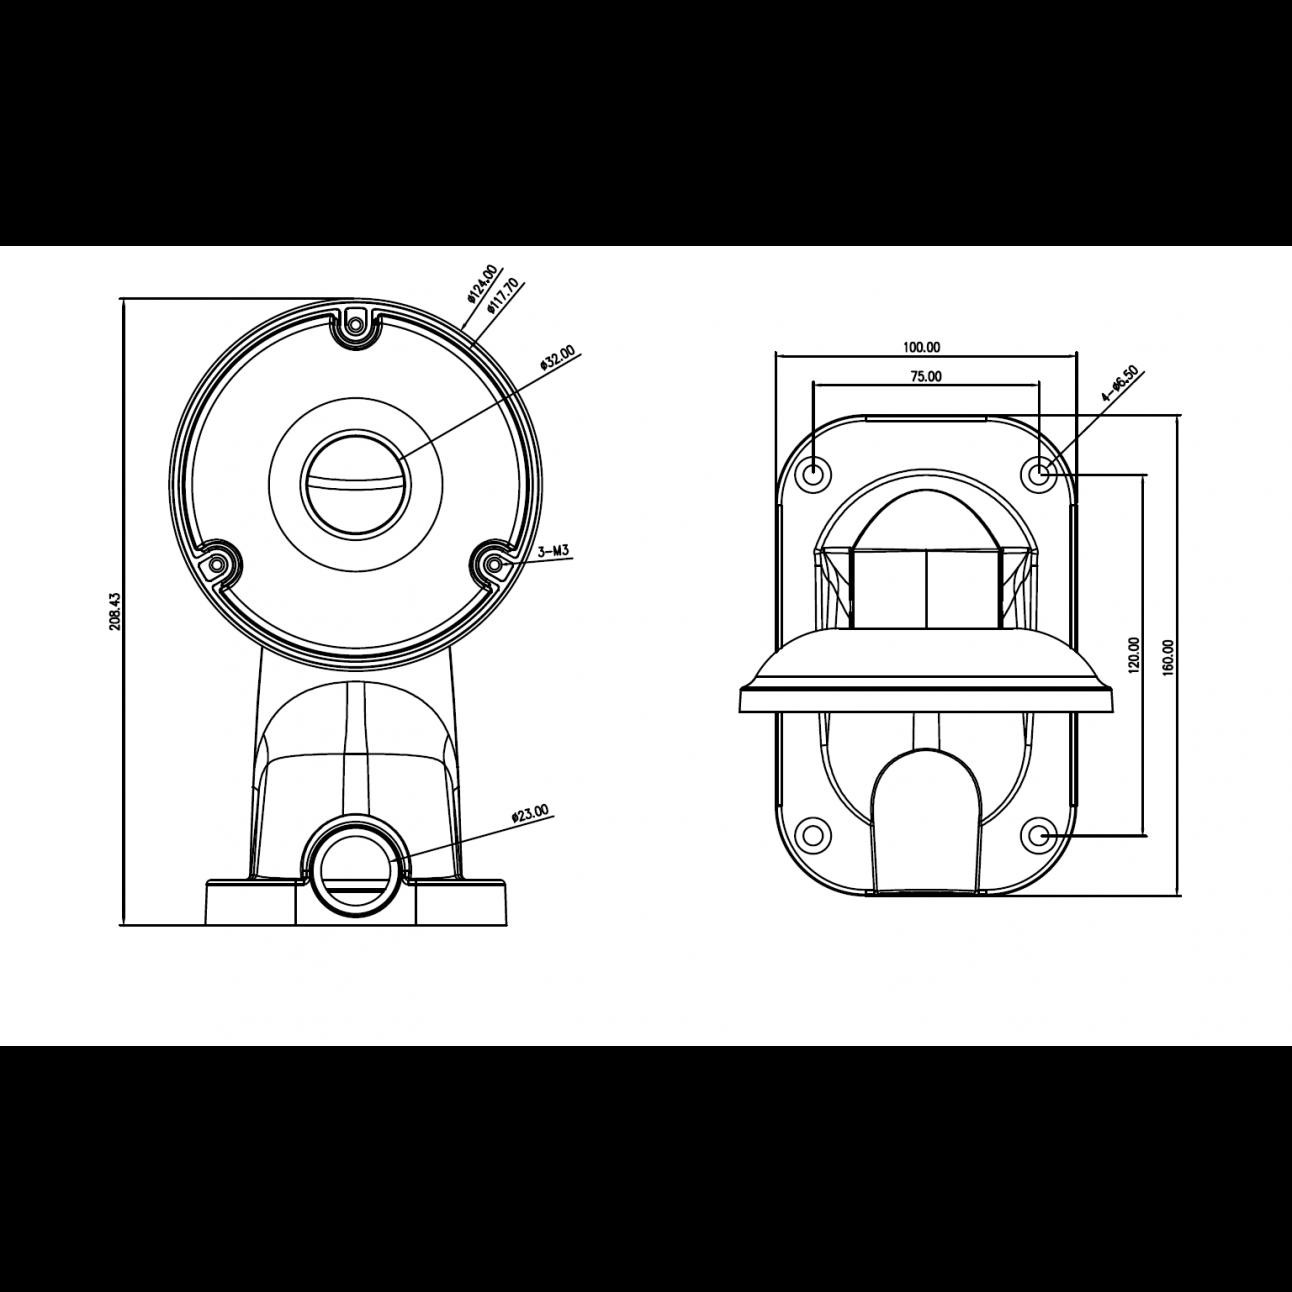 Настенный кронштейн для мини камер 404M, 606M